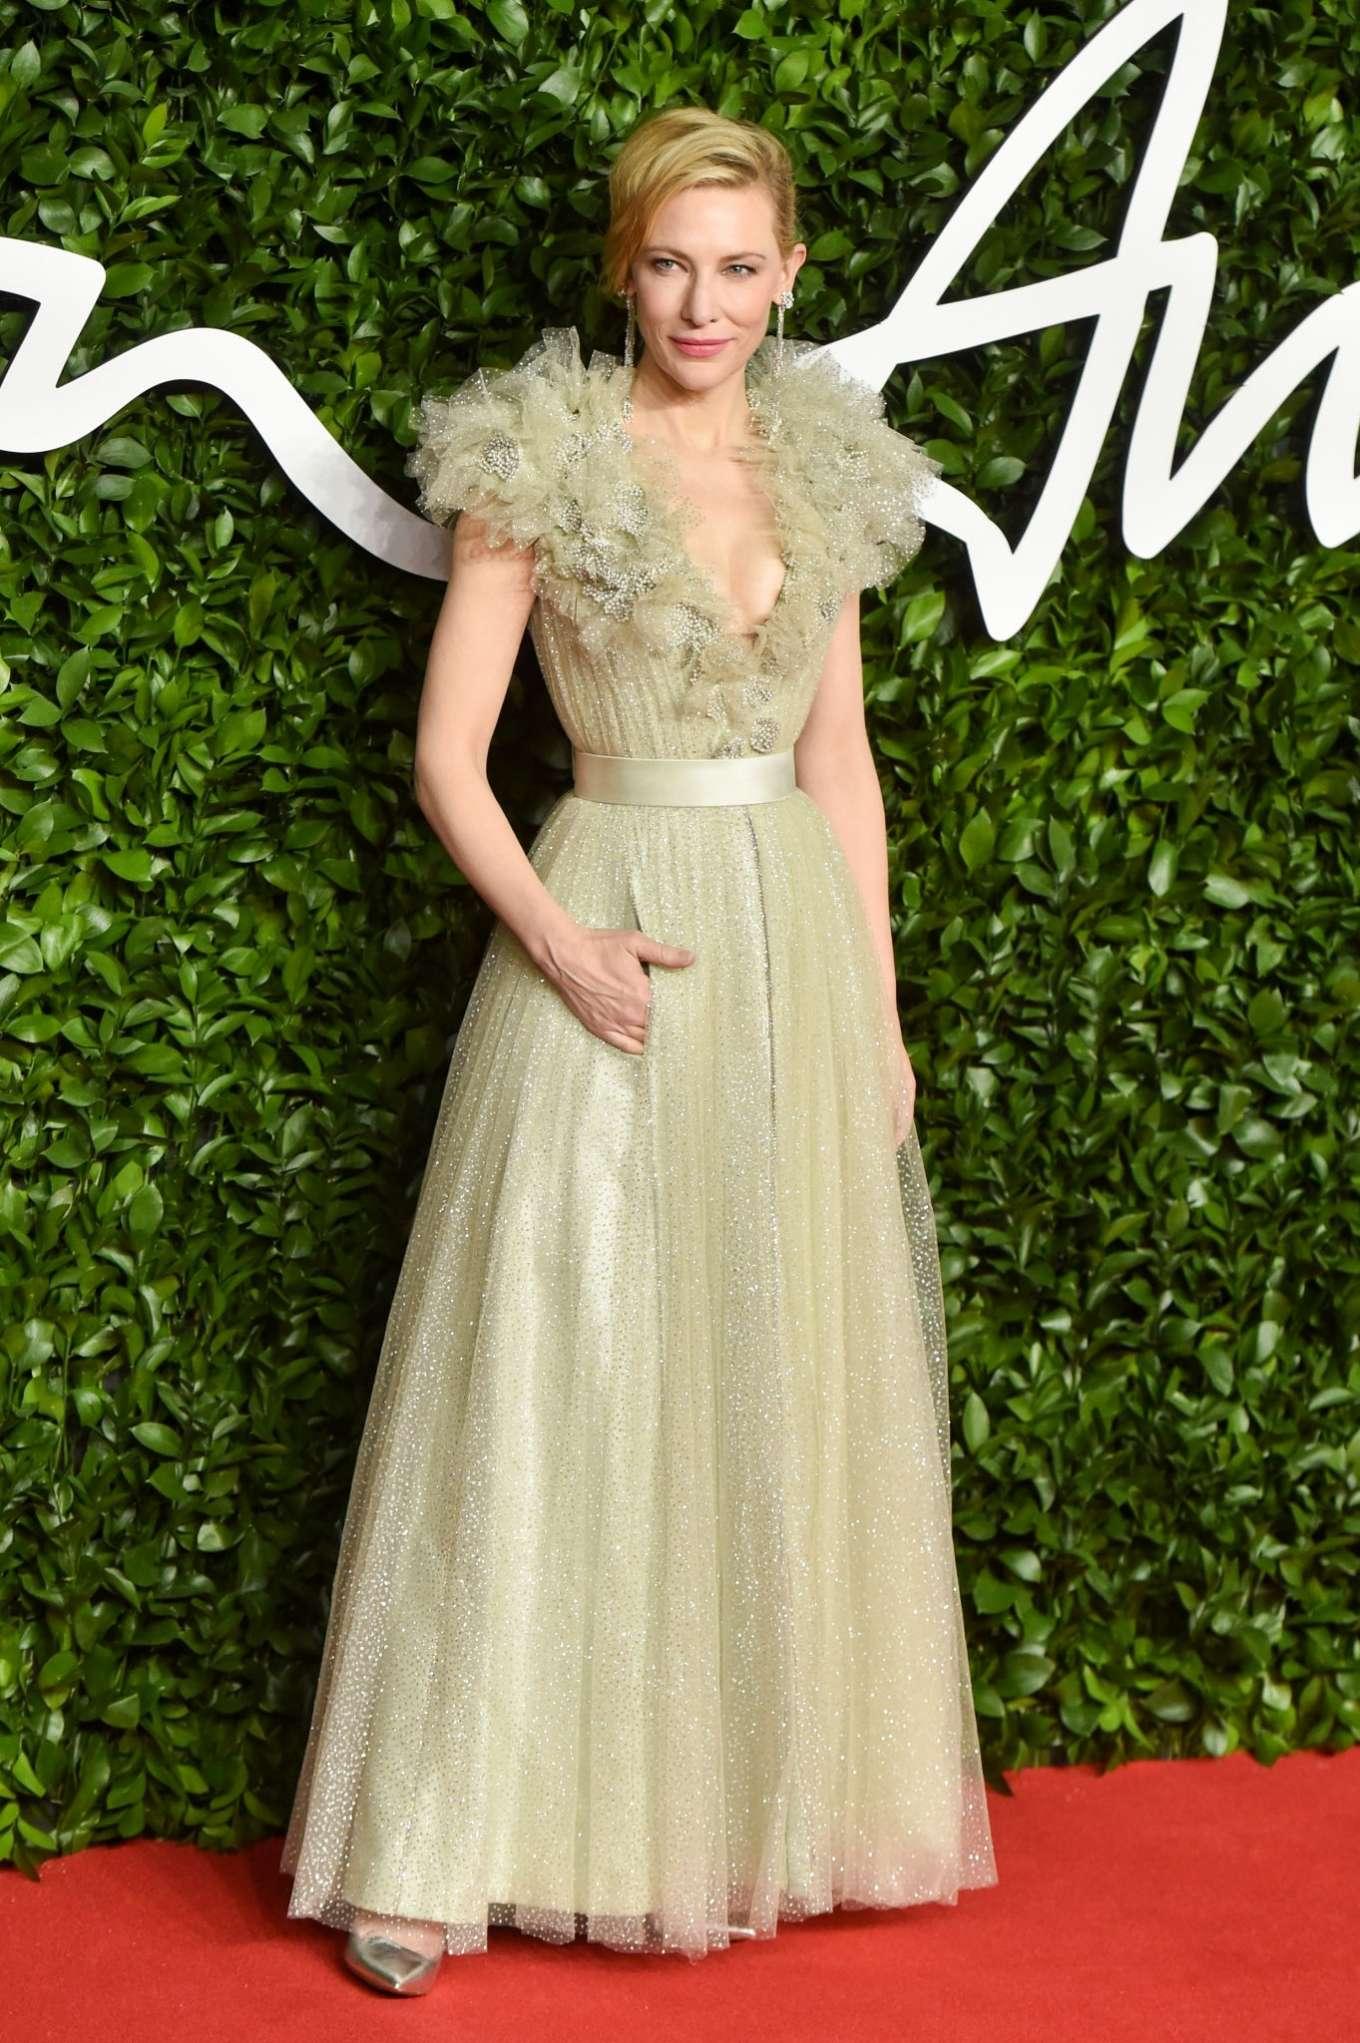 Cate Blanchett 2019 : Cate Blanchett – Fashion Awards 2019 in London-03